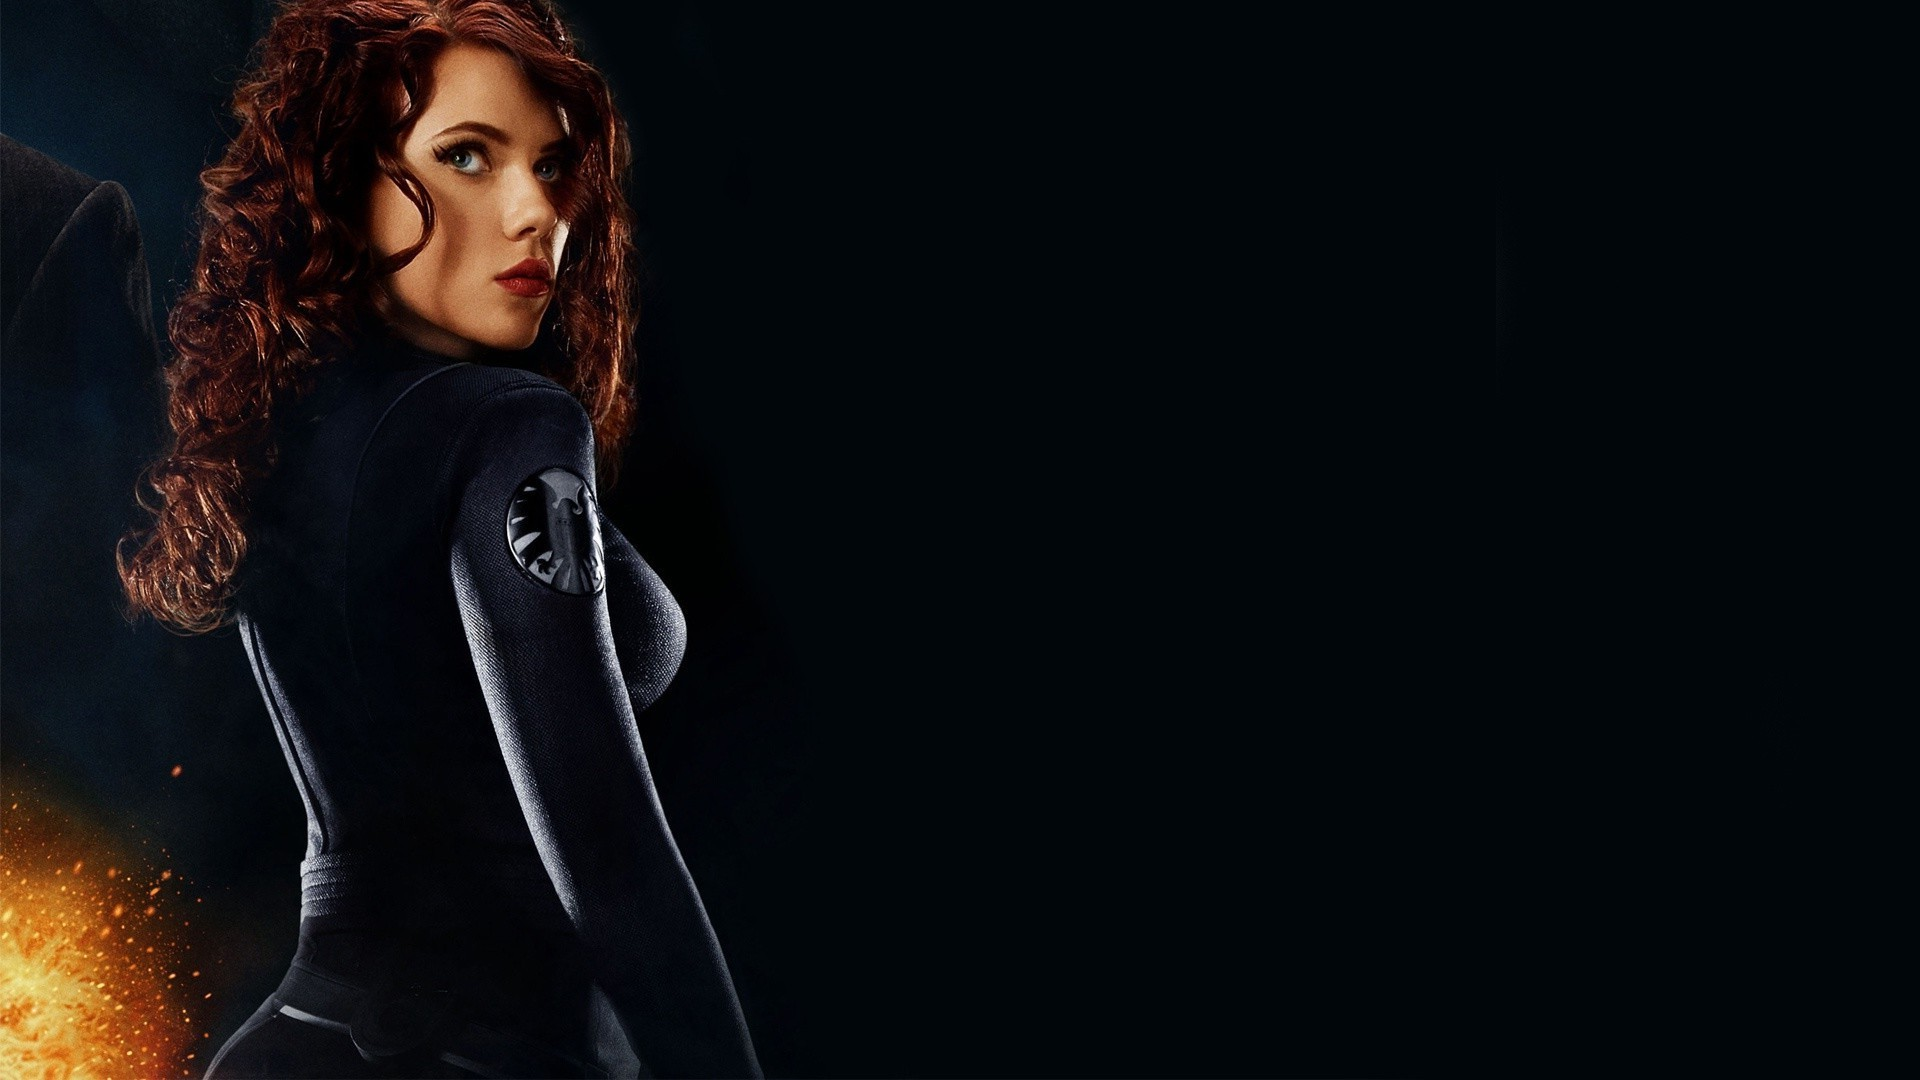 Iron Man 2 Black Background Movies Wallpaper: 42 Voluptuous Facts About Scarlett Johansson